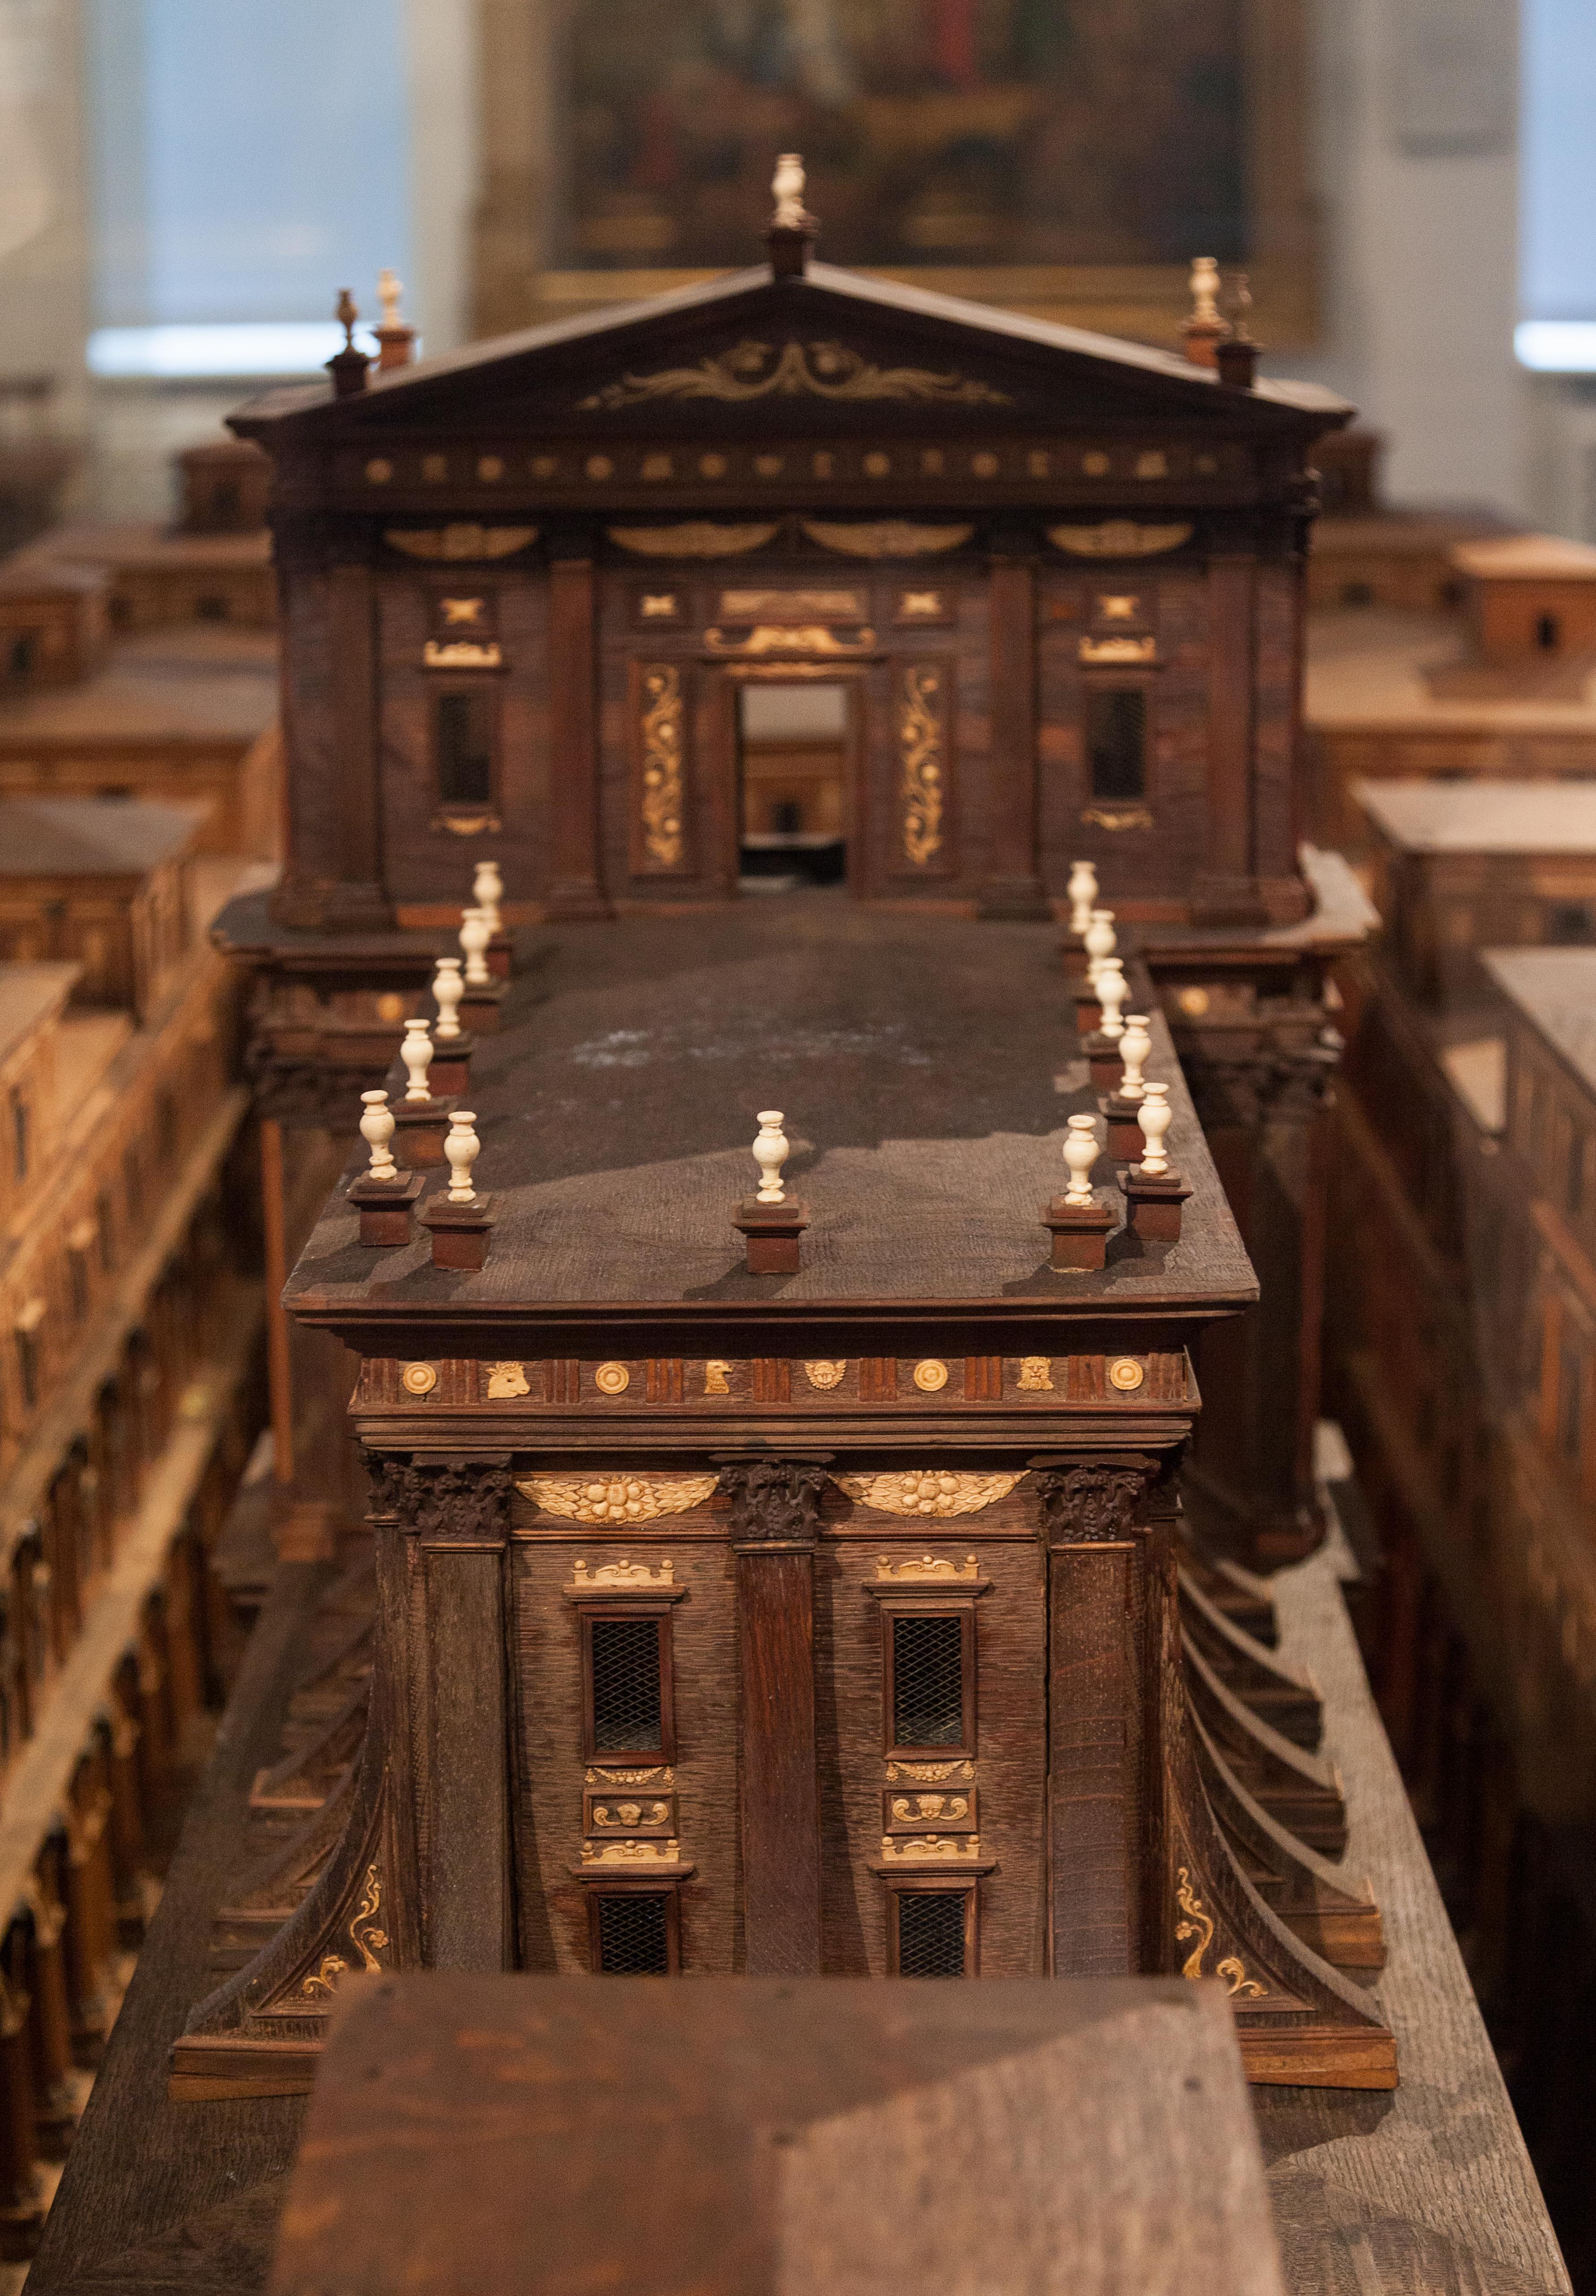 Modell des Salomonischen Tempels in Jerusalem